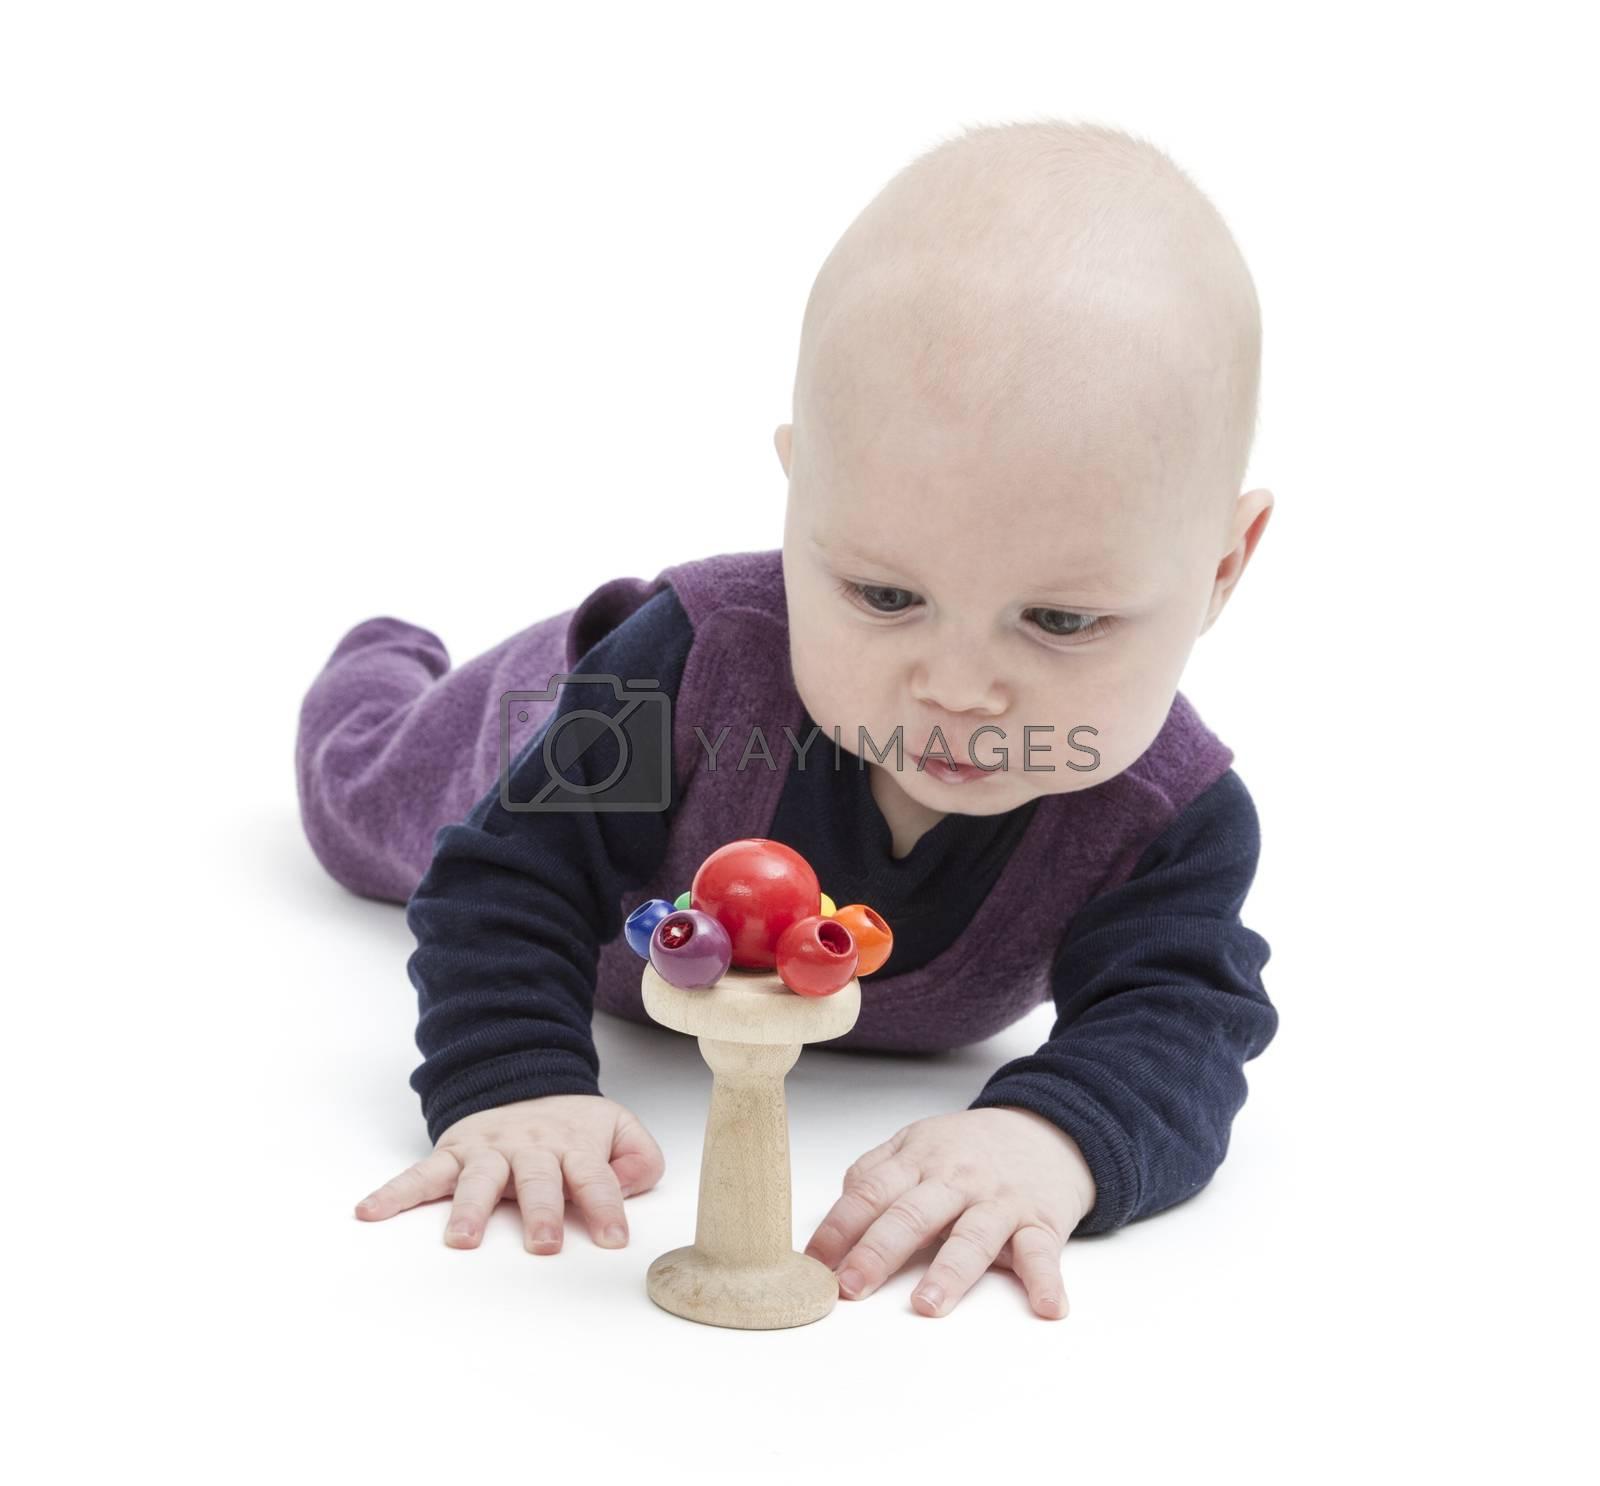 toddler lokking at toy, studio shot isolated on white background